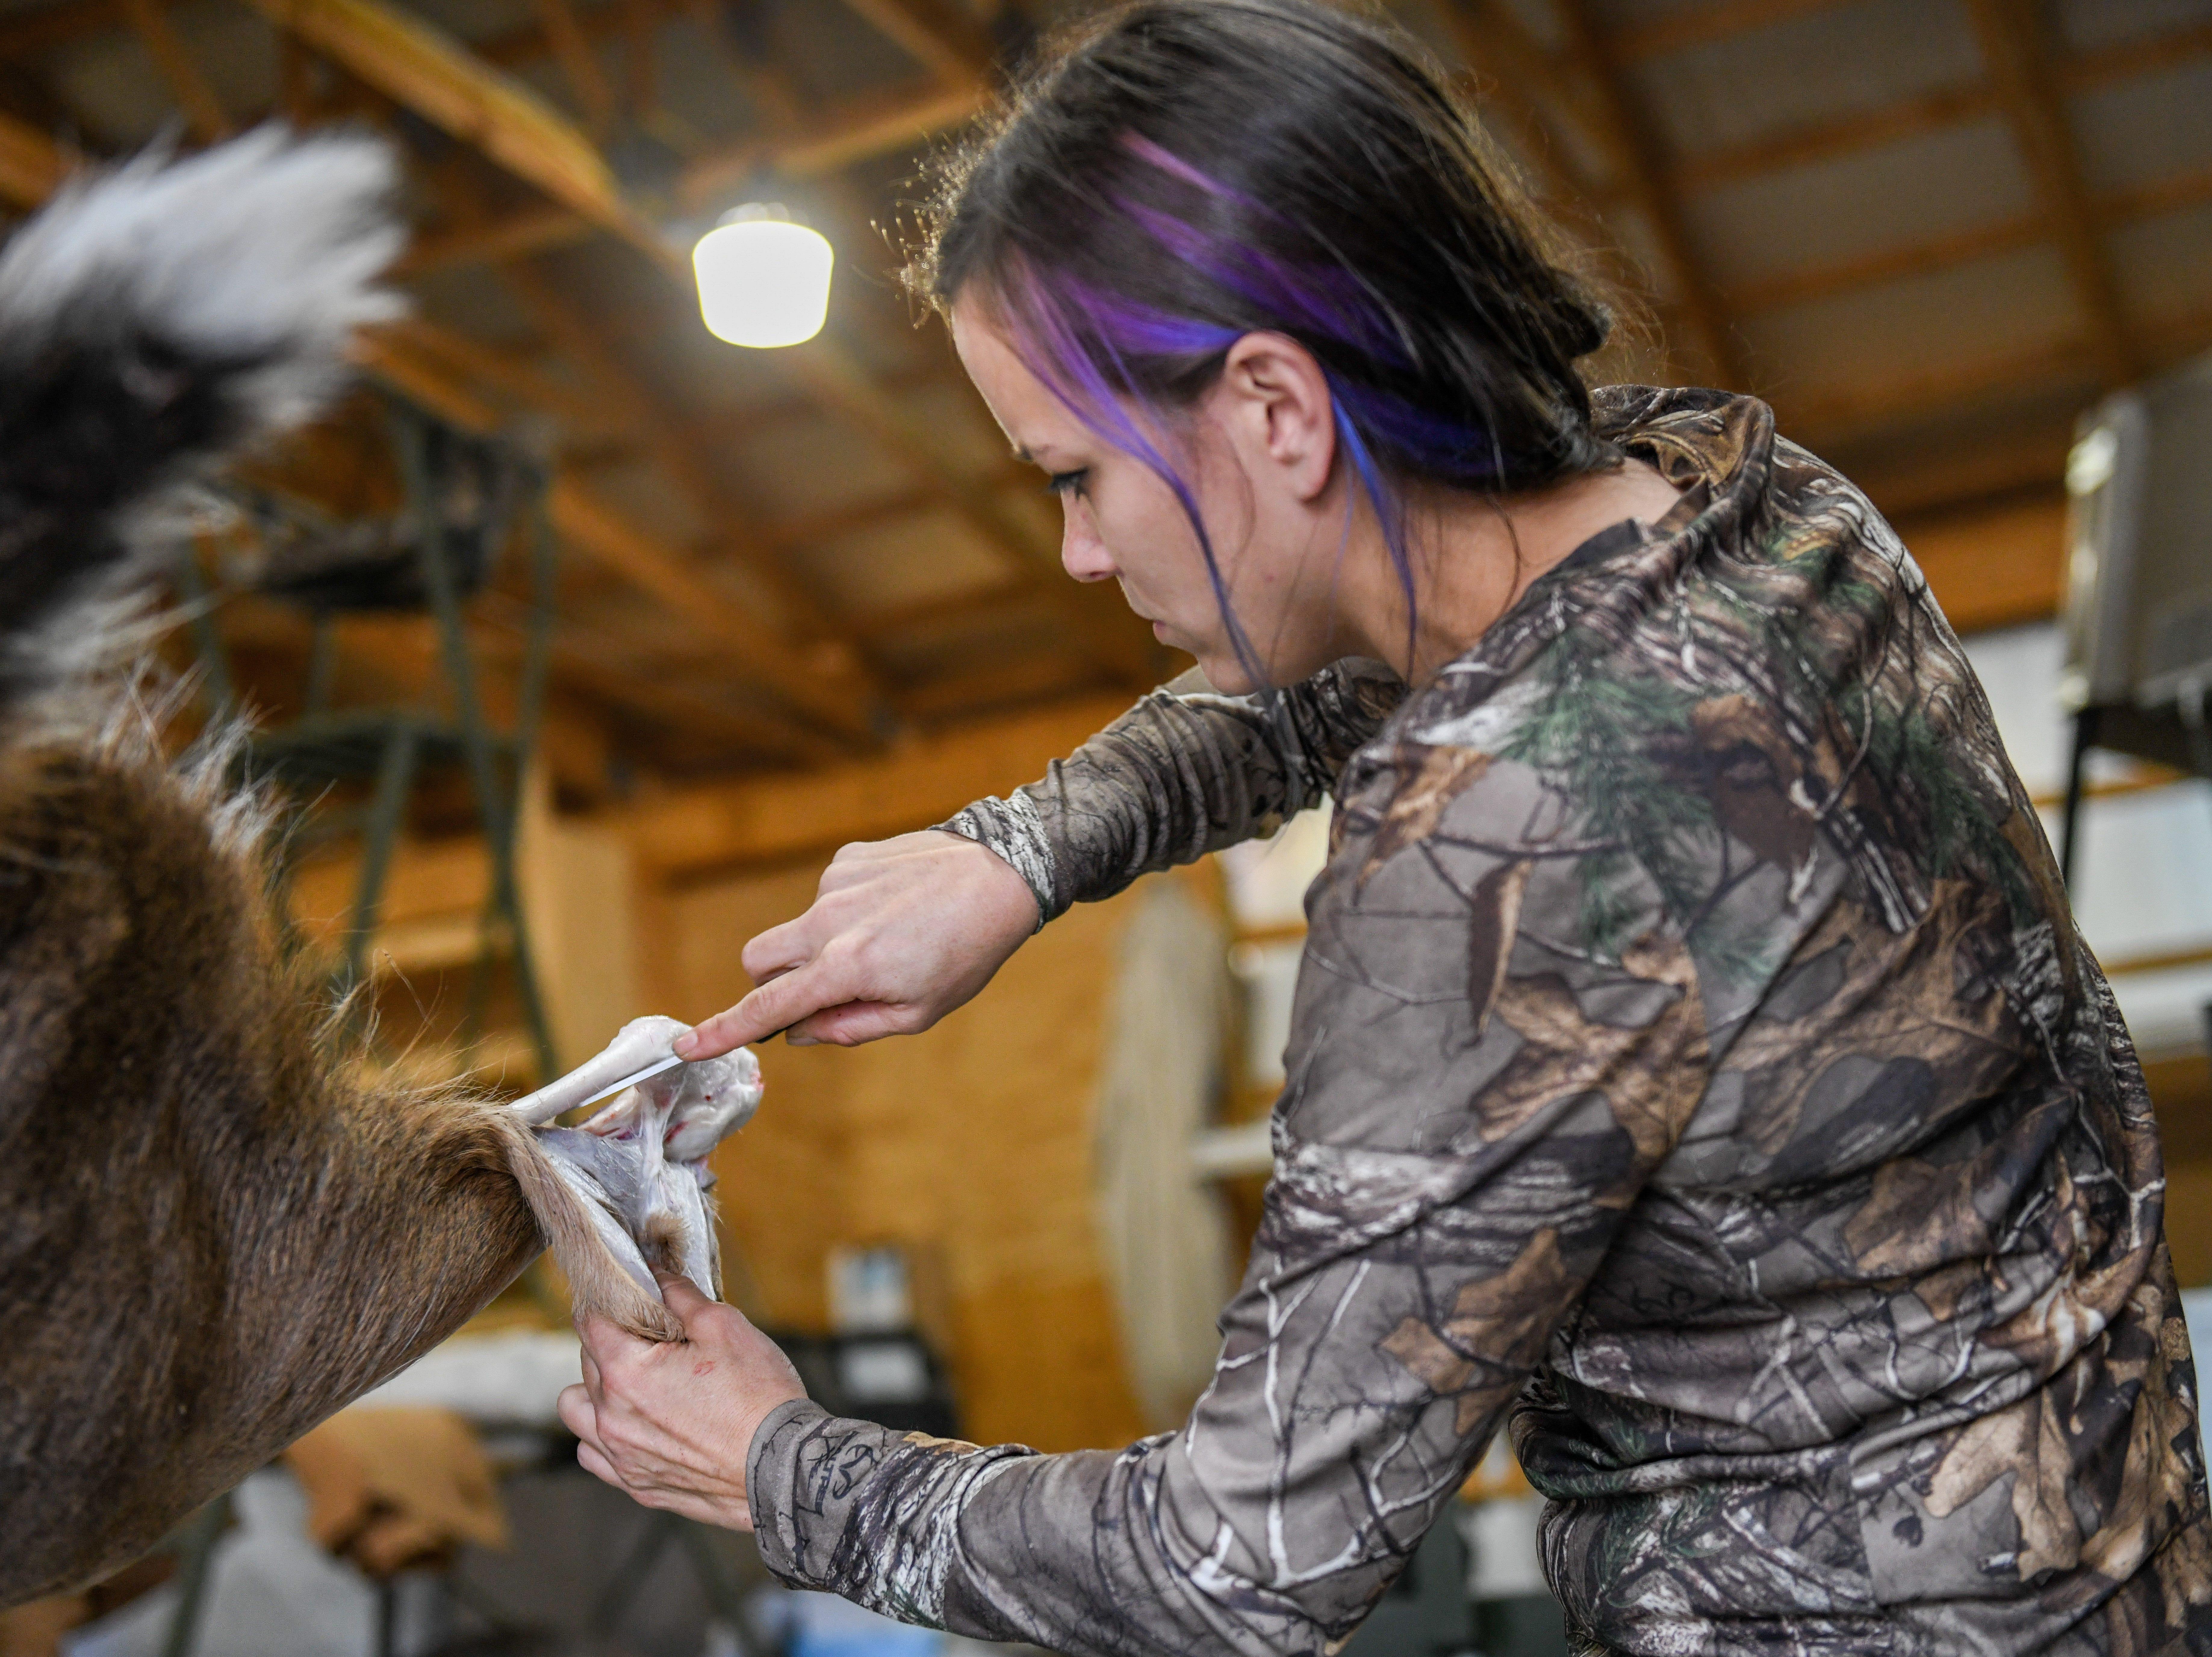 Maribeth Kulynycz helps to butcher a deer in Mardela Springs on Tuesday, Nov 6, 2018.